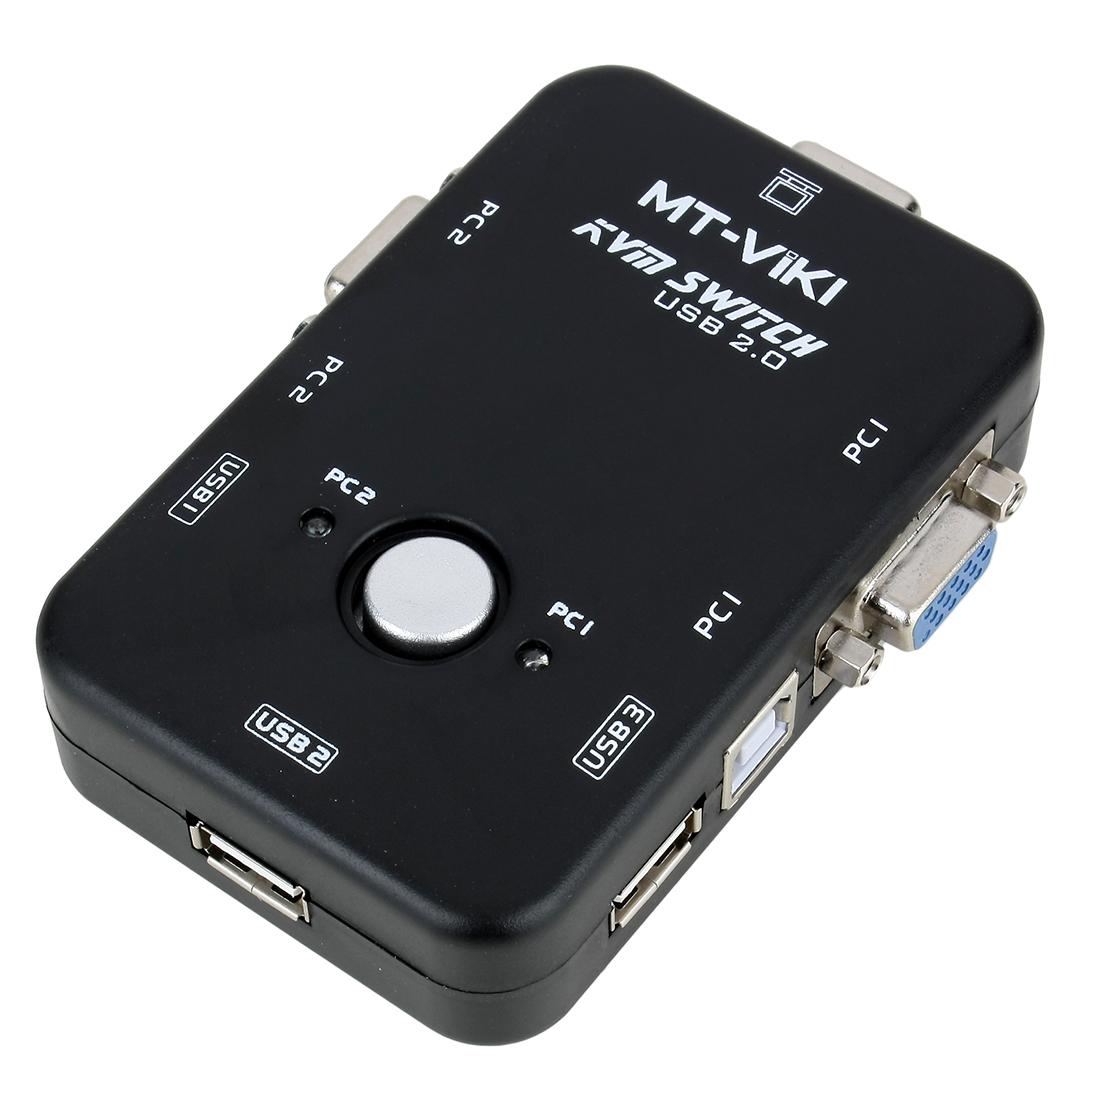 VGA/SVGA KVM Switch Box 2 Port USB 2.0 Devices Share Mouse Keyboard Monitor